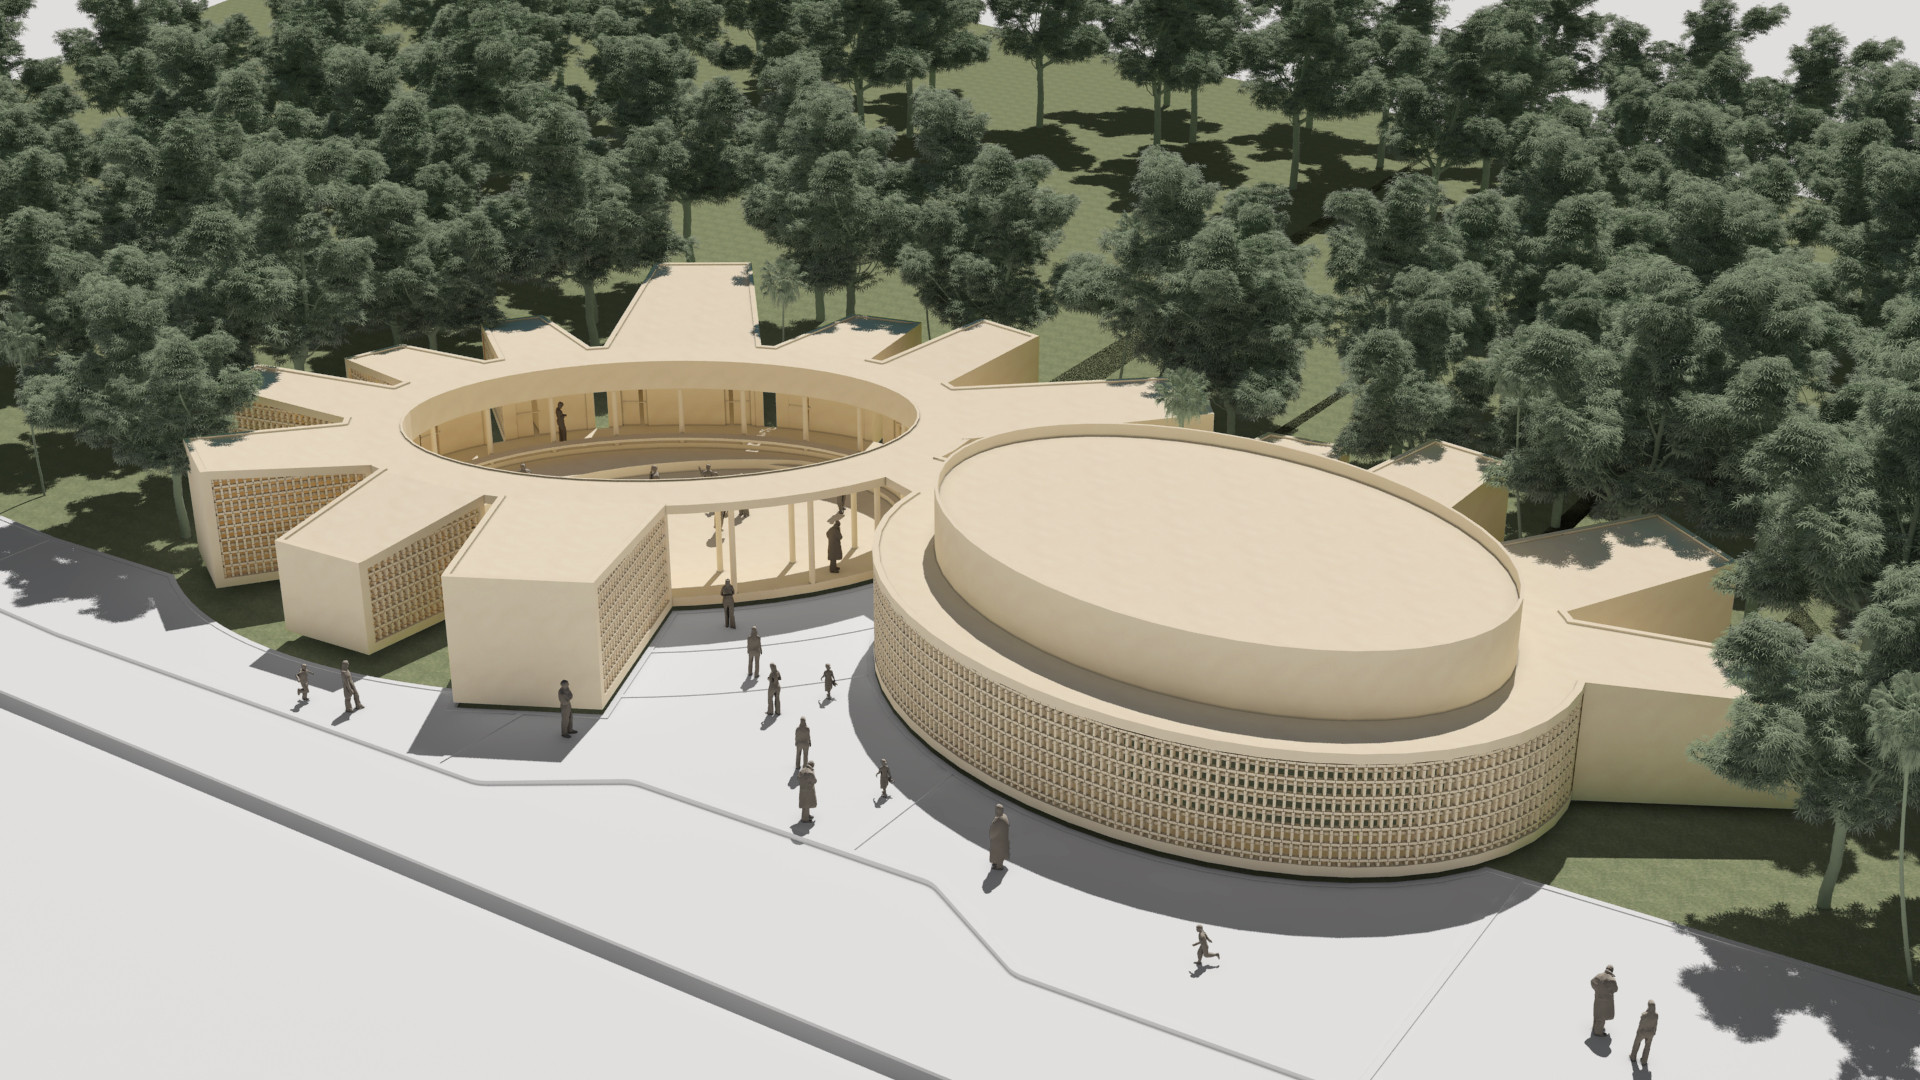 Galeria de primeiro lugar no concurso prot tipo de escola for Plantas de colegios arquitectura